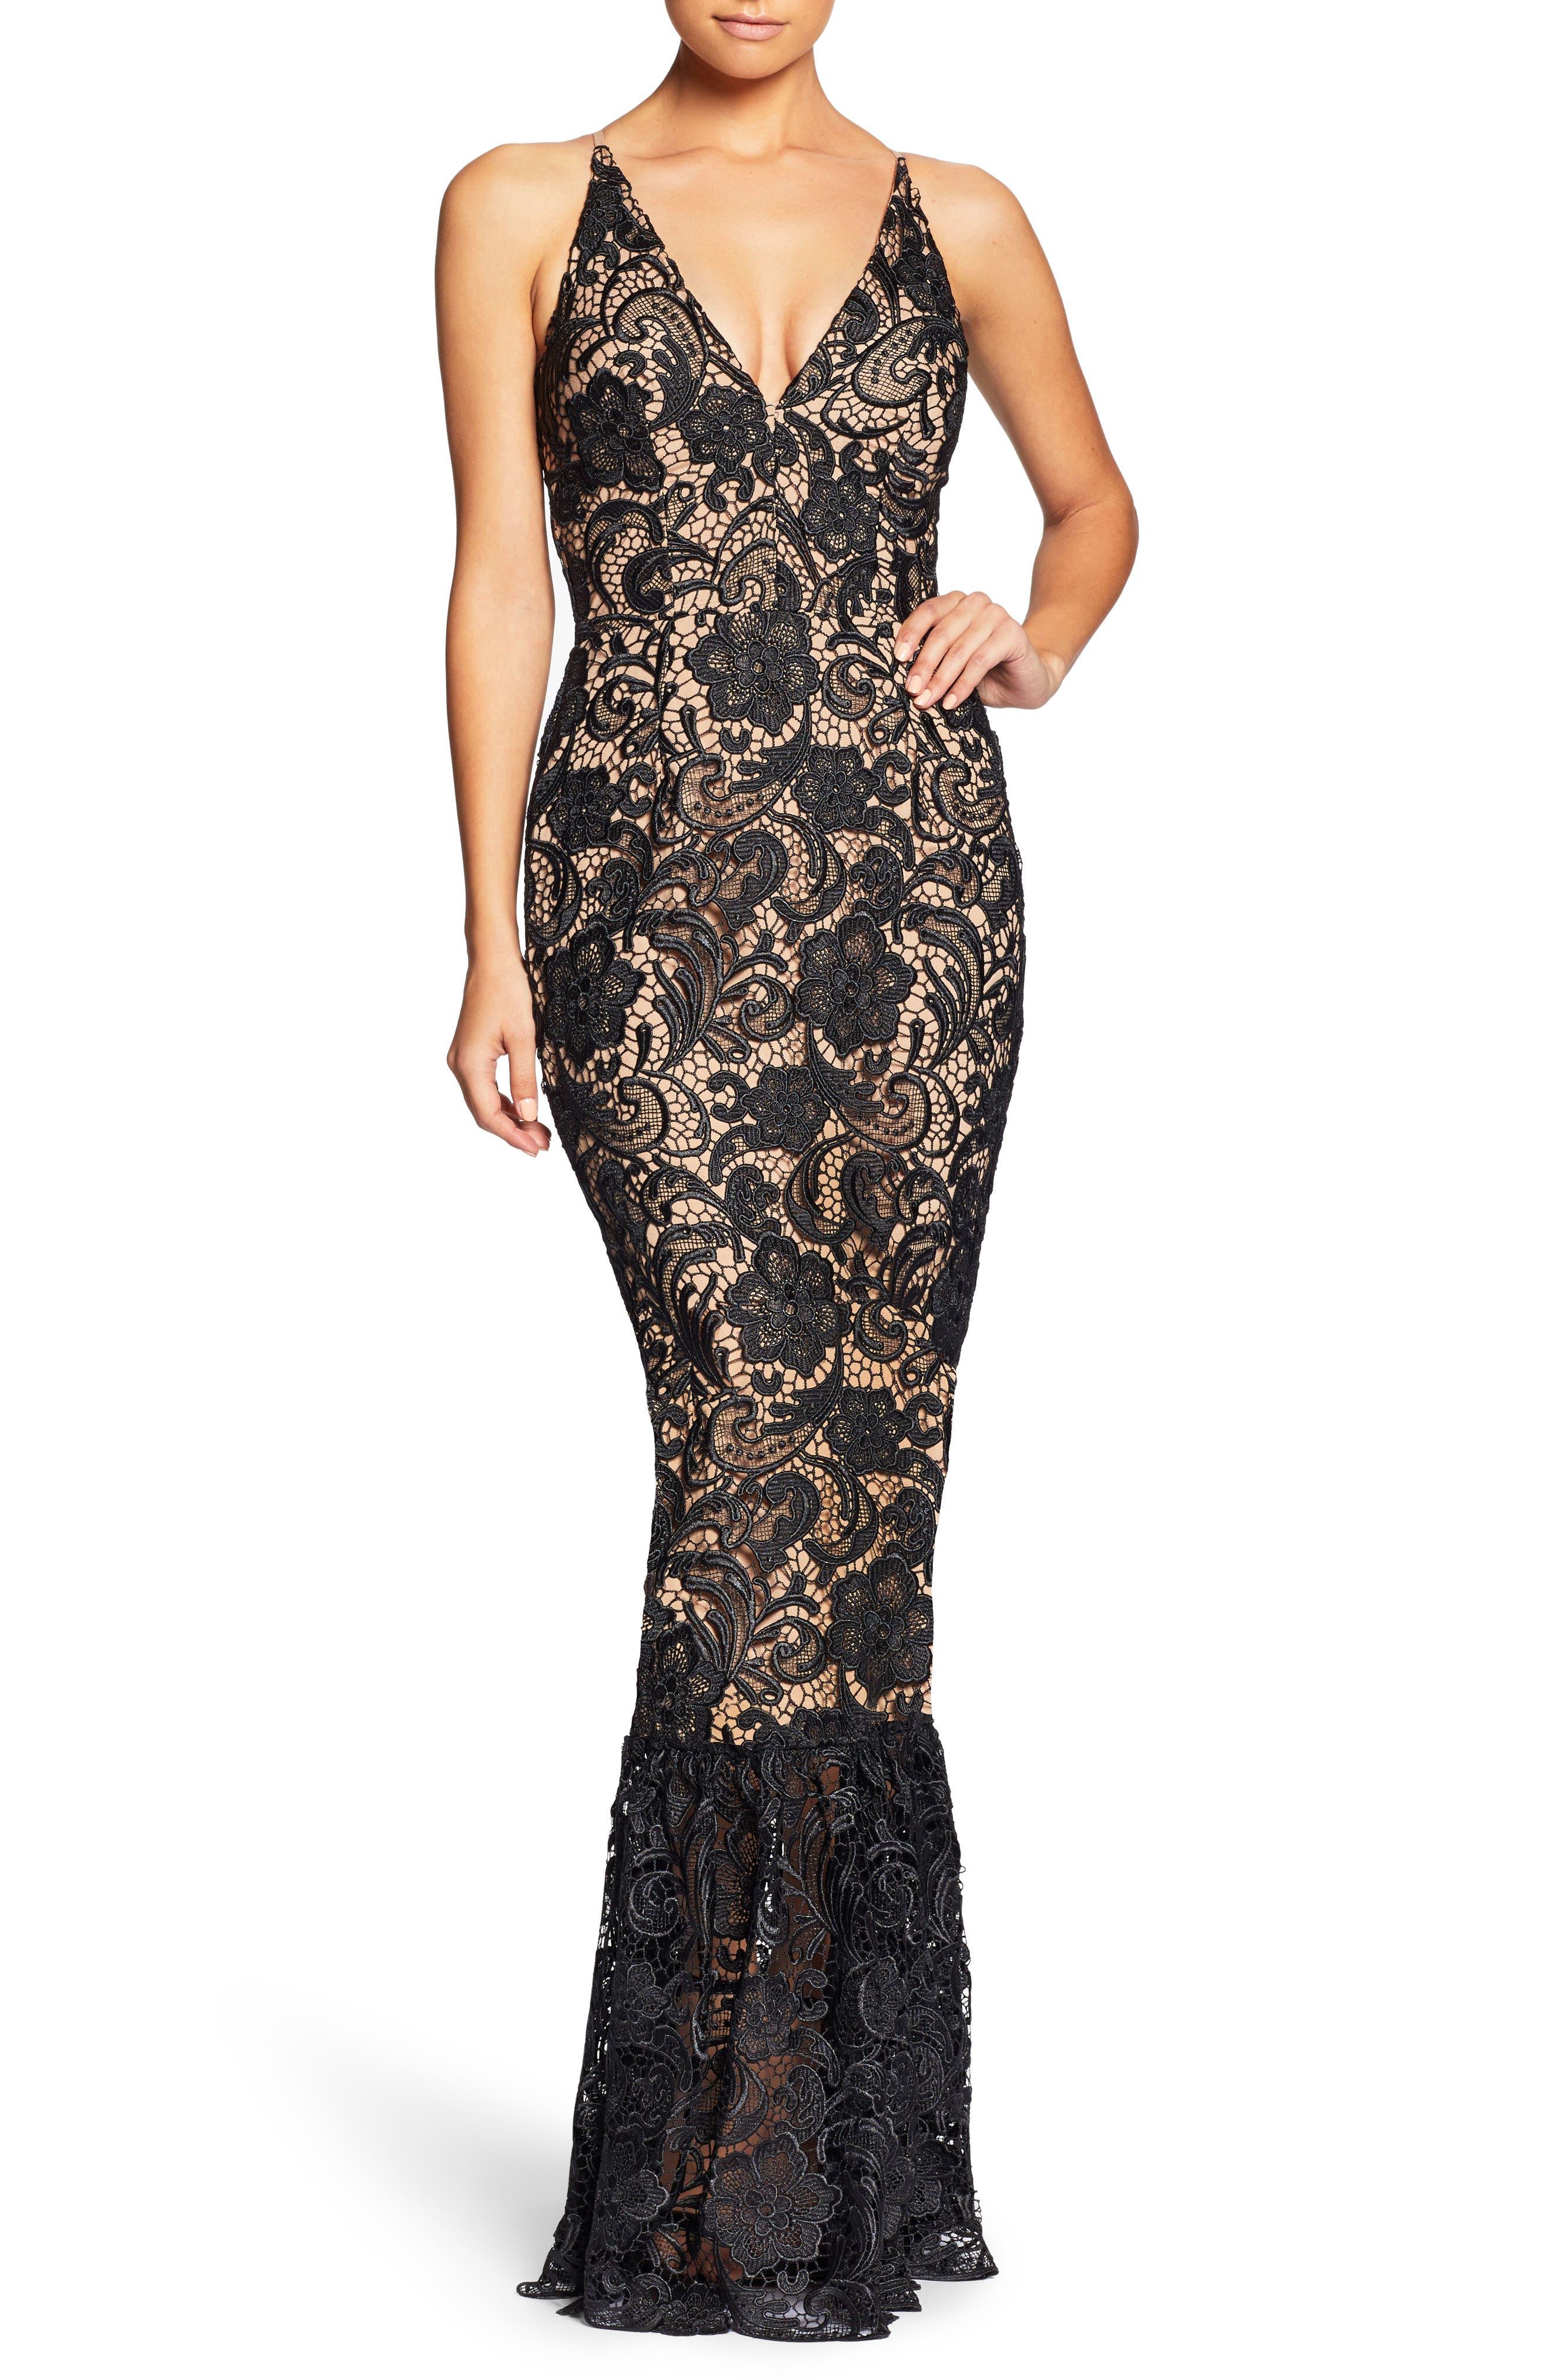 Main Image - Dress the Population Sophia Crochet Lace Mermaid Gown